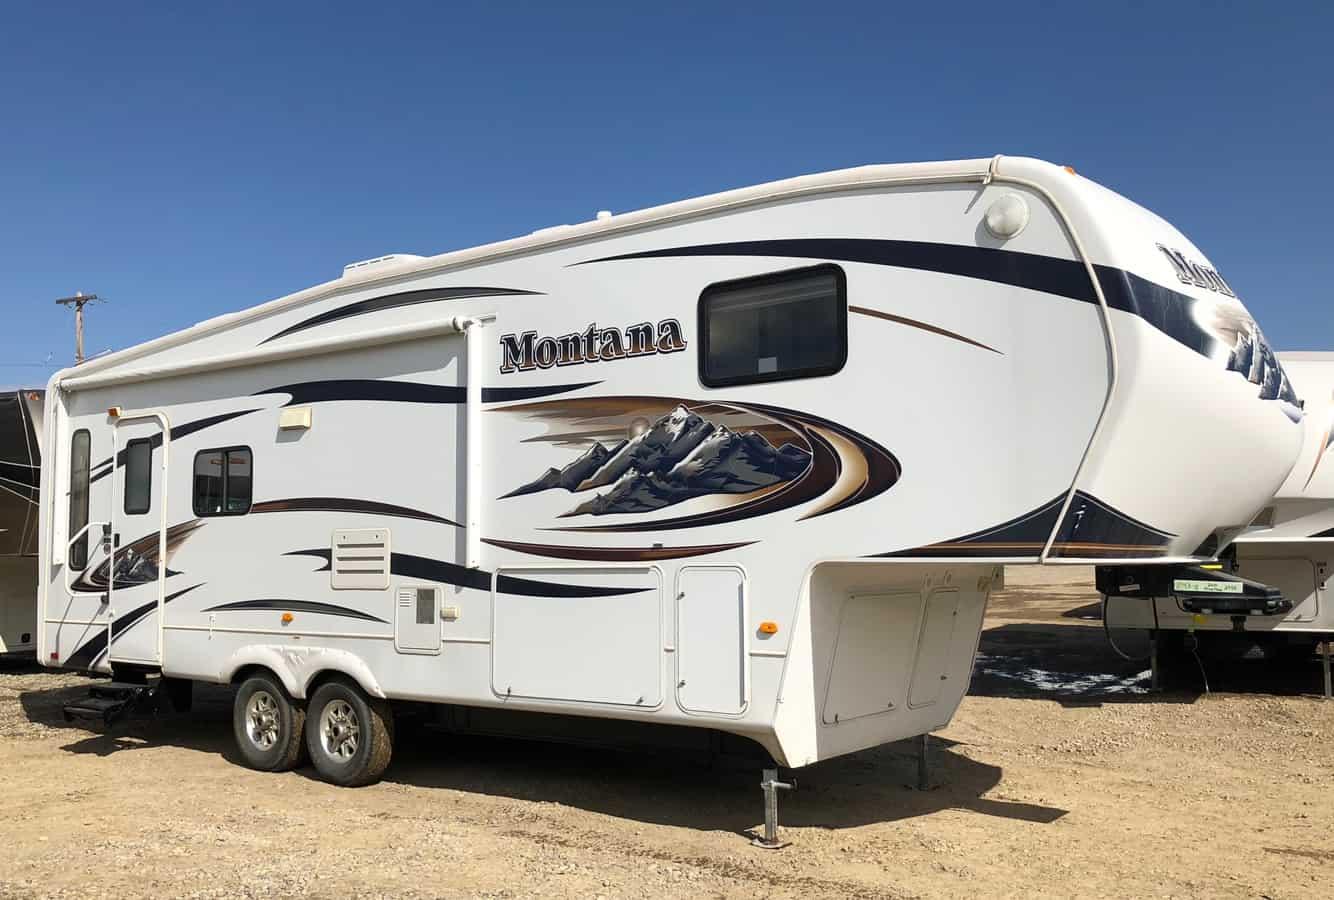 USED 2010 Keystone MONTANA 2955